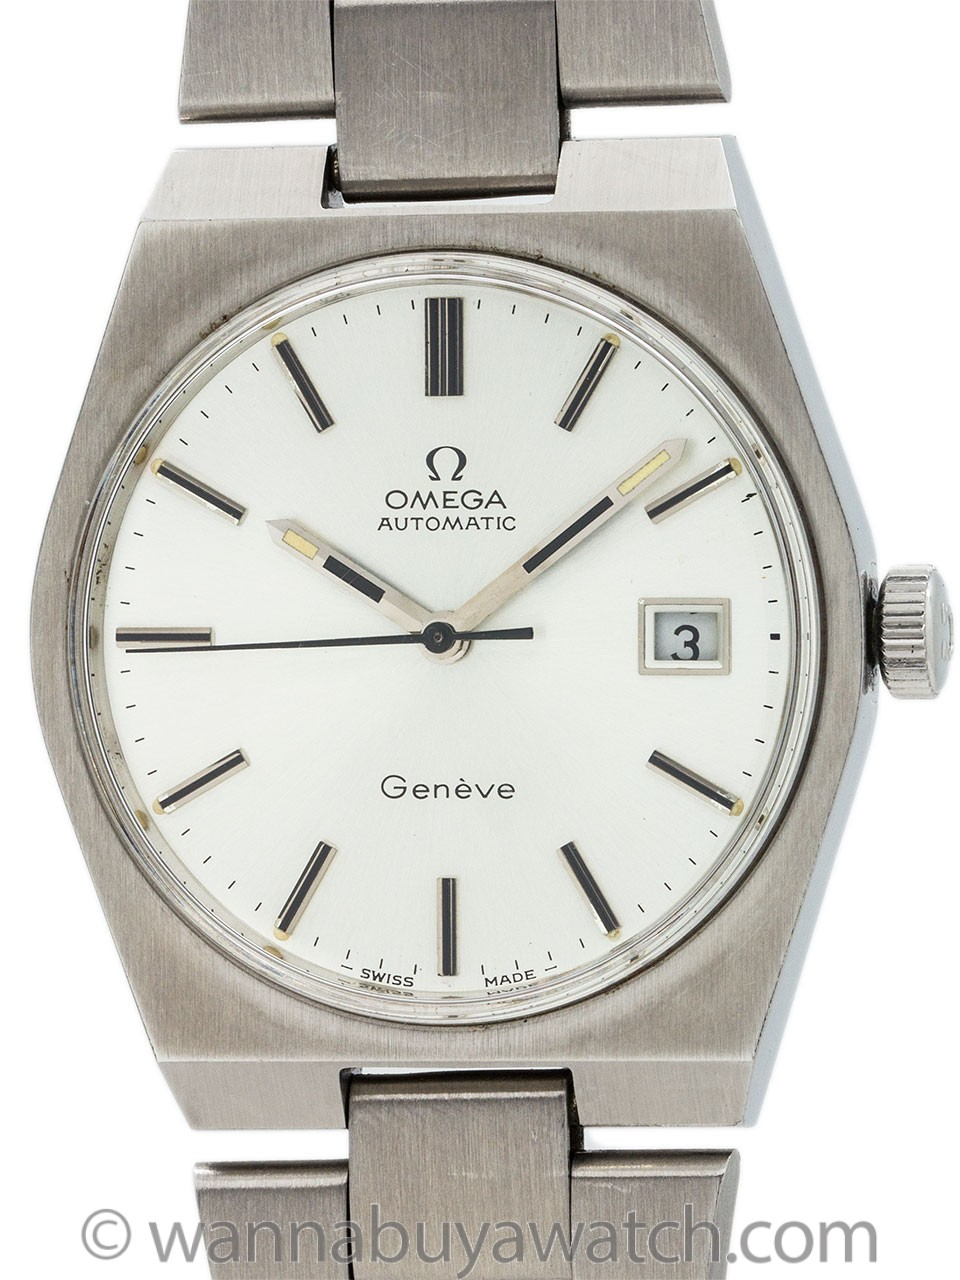 Omega Automatic Geneve ref 166.00.99 circa 1973